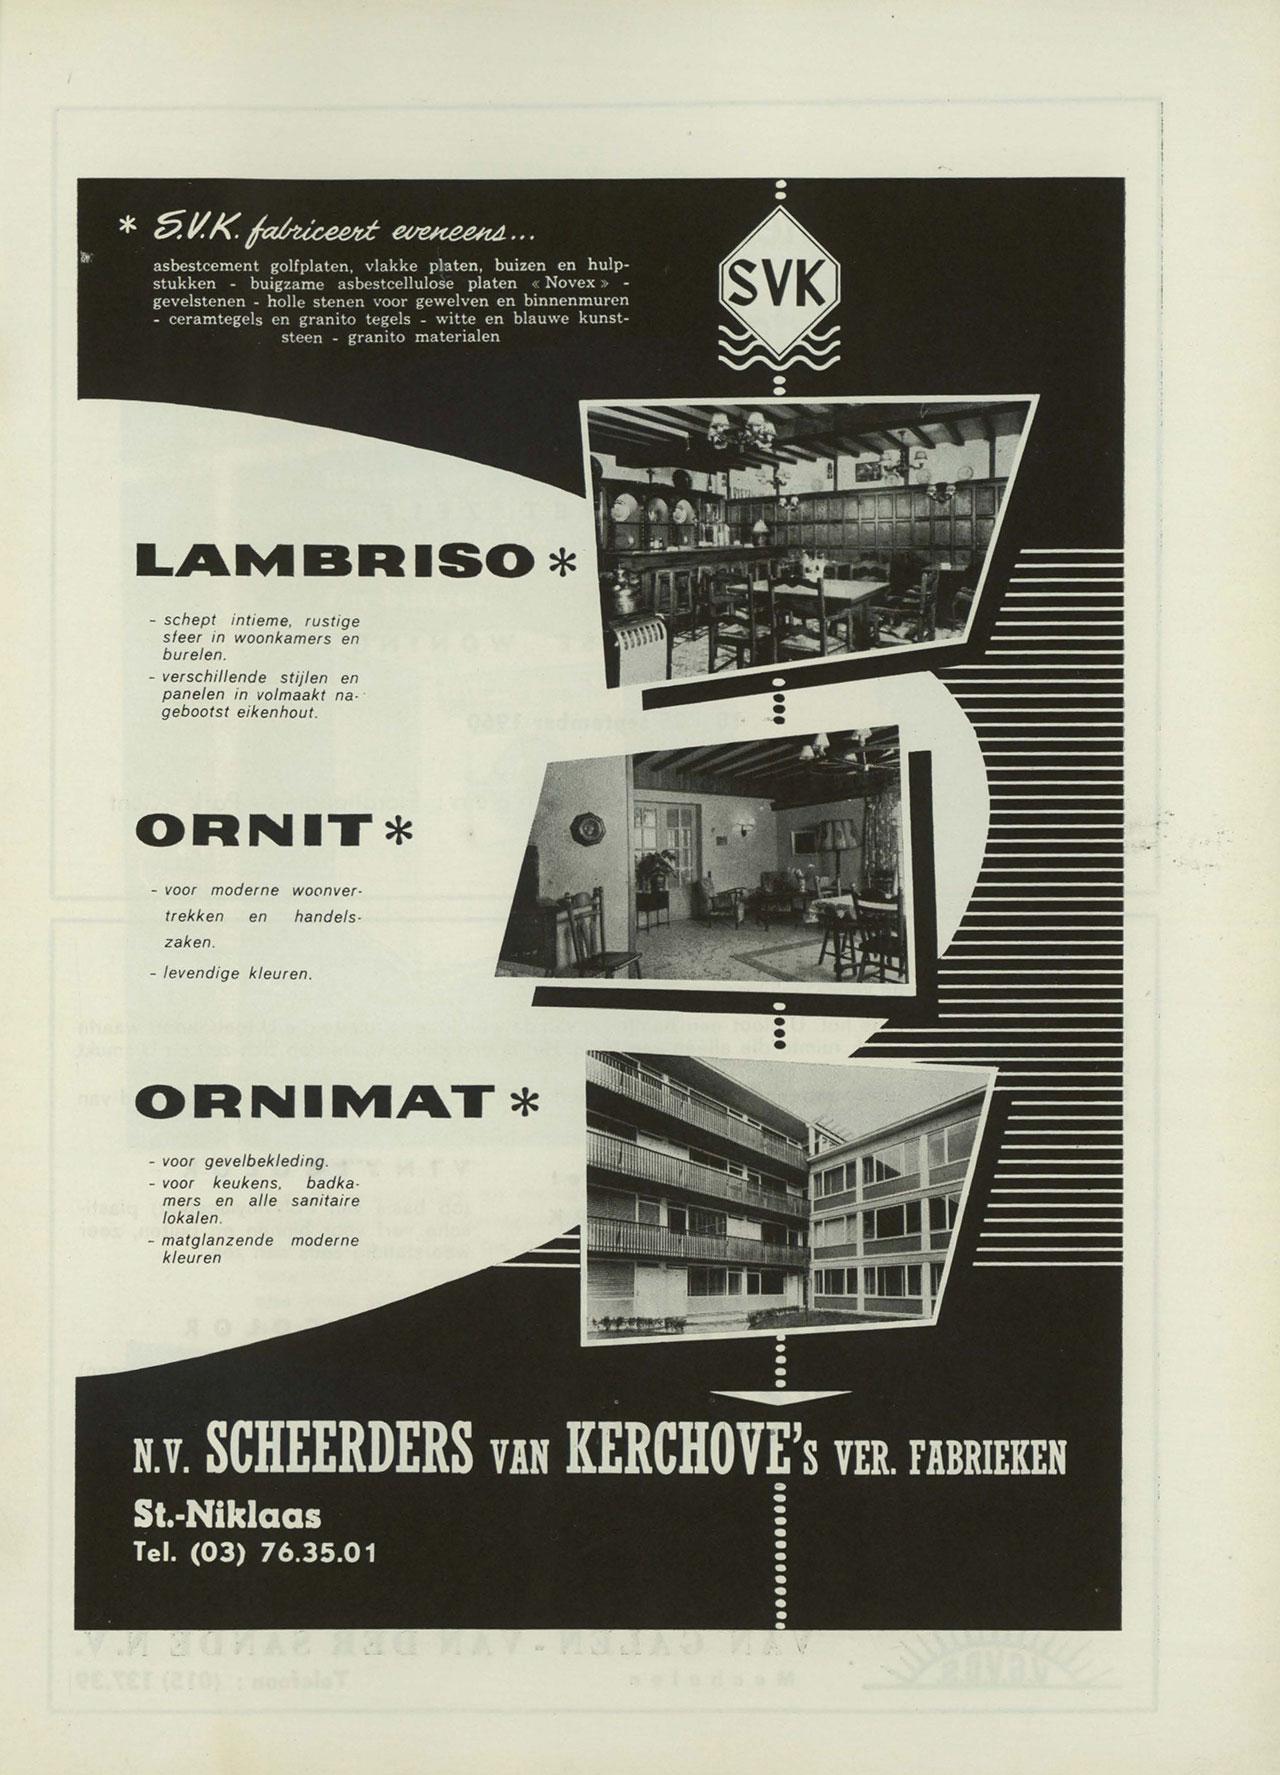 Lambriso, Ornit, Ornimat